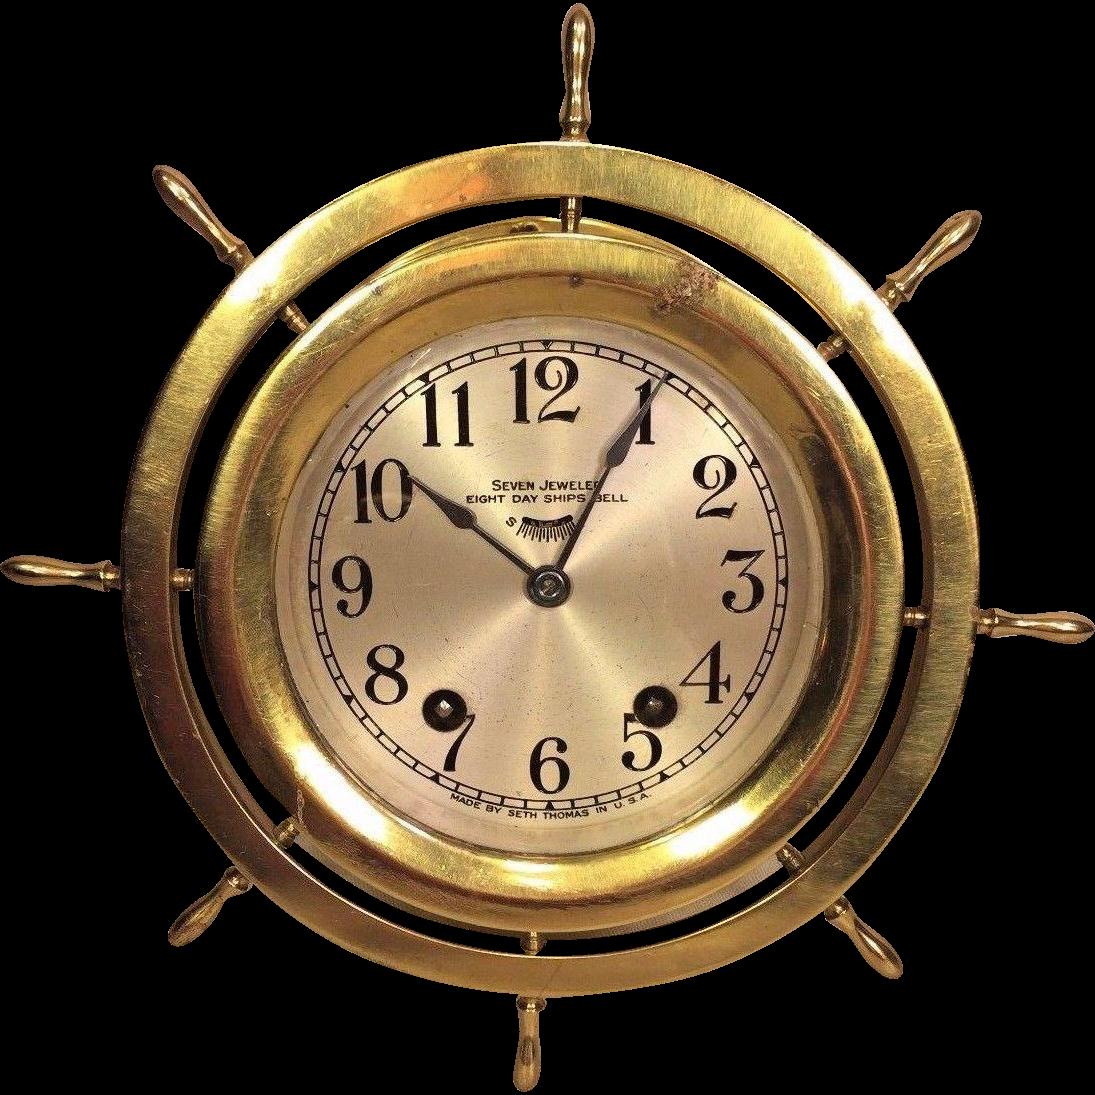 Ship wall clock image collections home wall decoration ideas splendid ship wall clock 65 ship wheel wall clock wooden wall full image for bright ship wall clock 146 boat shaped wall clock russian ship clocks amipublicfo Images